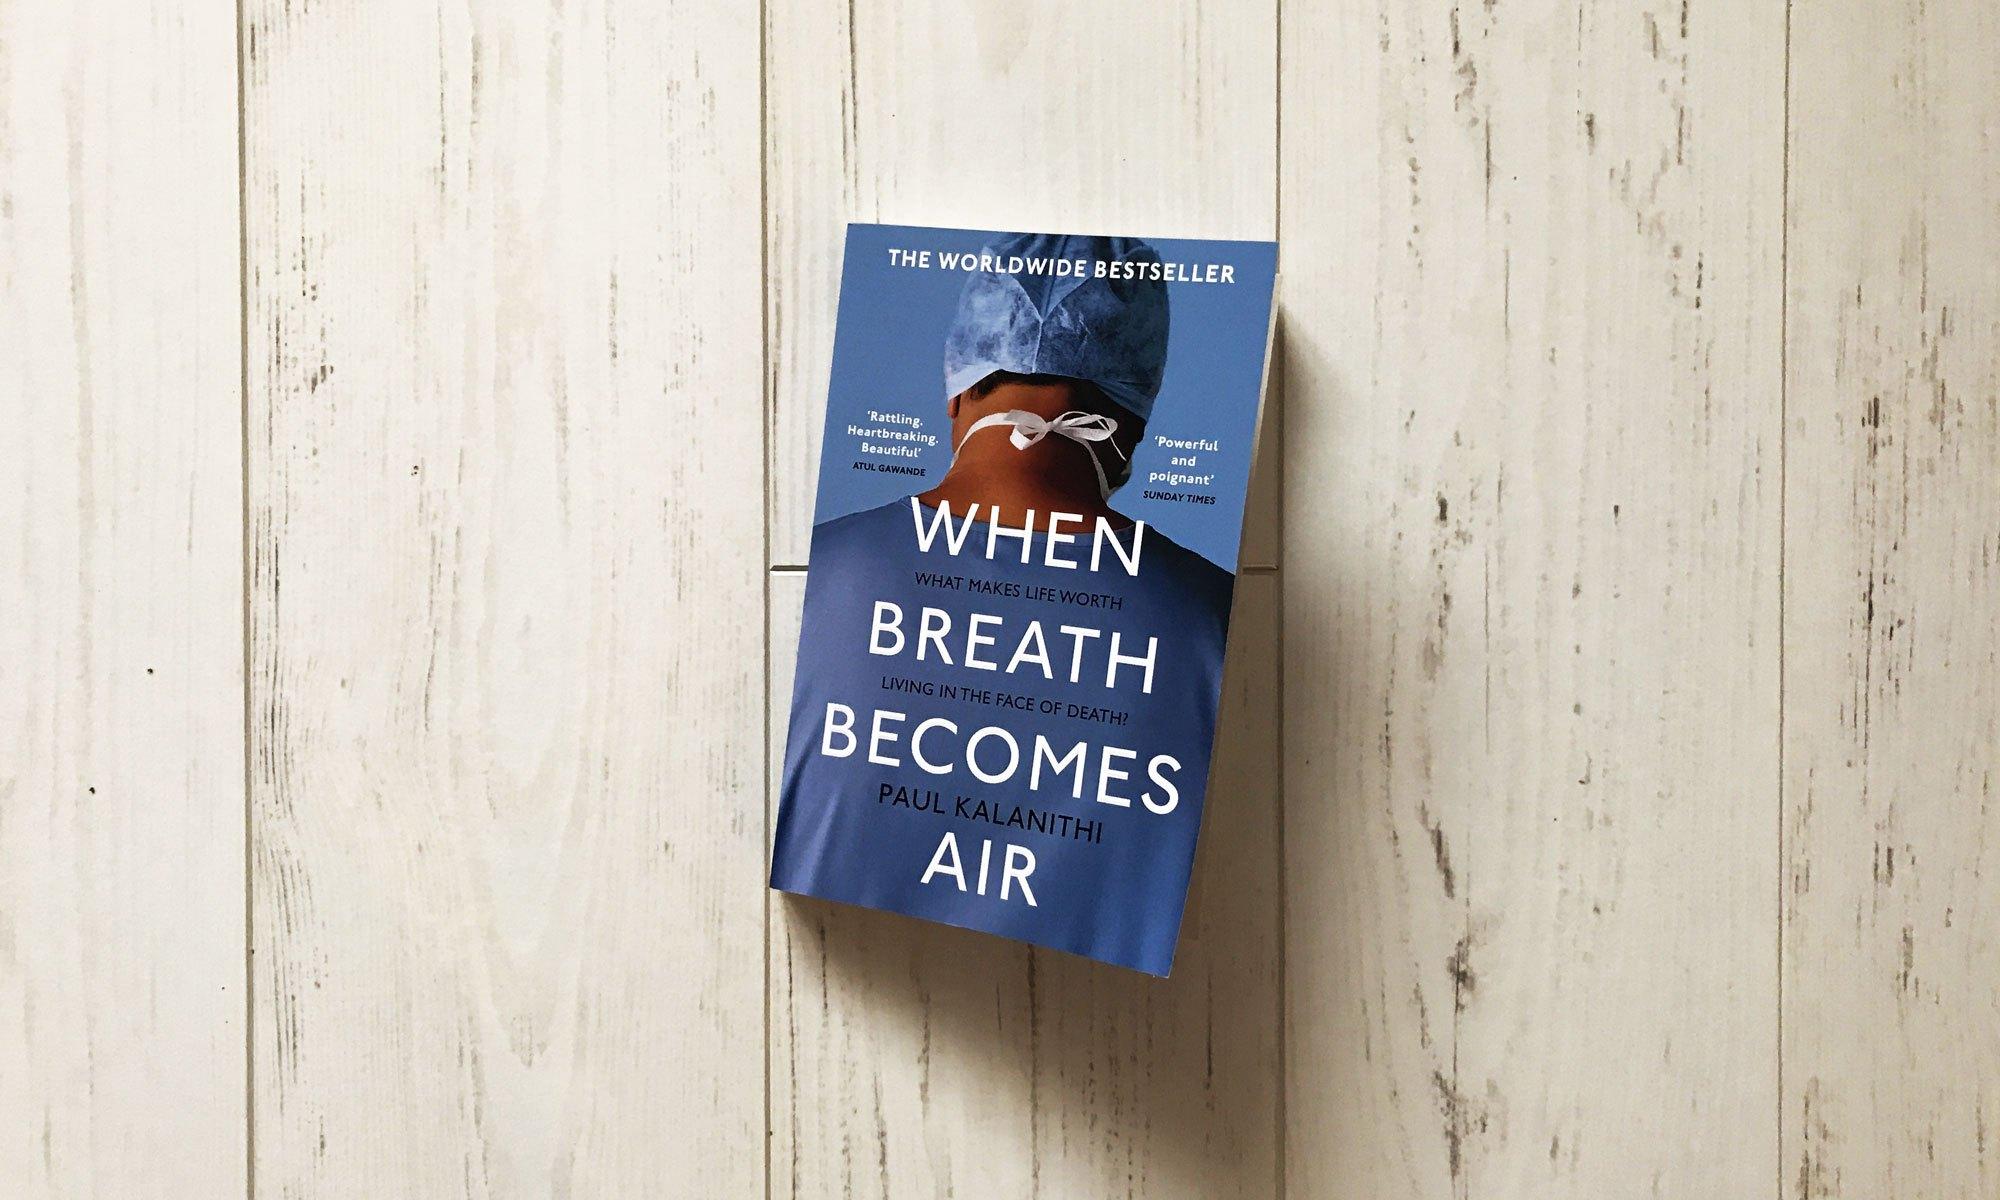 Paul Kalanithi when breath becomes air